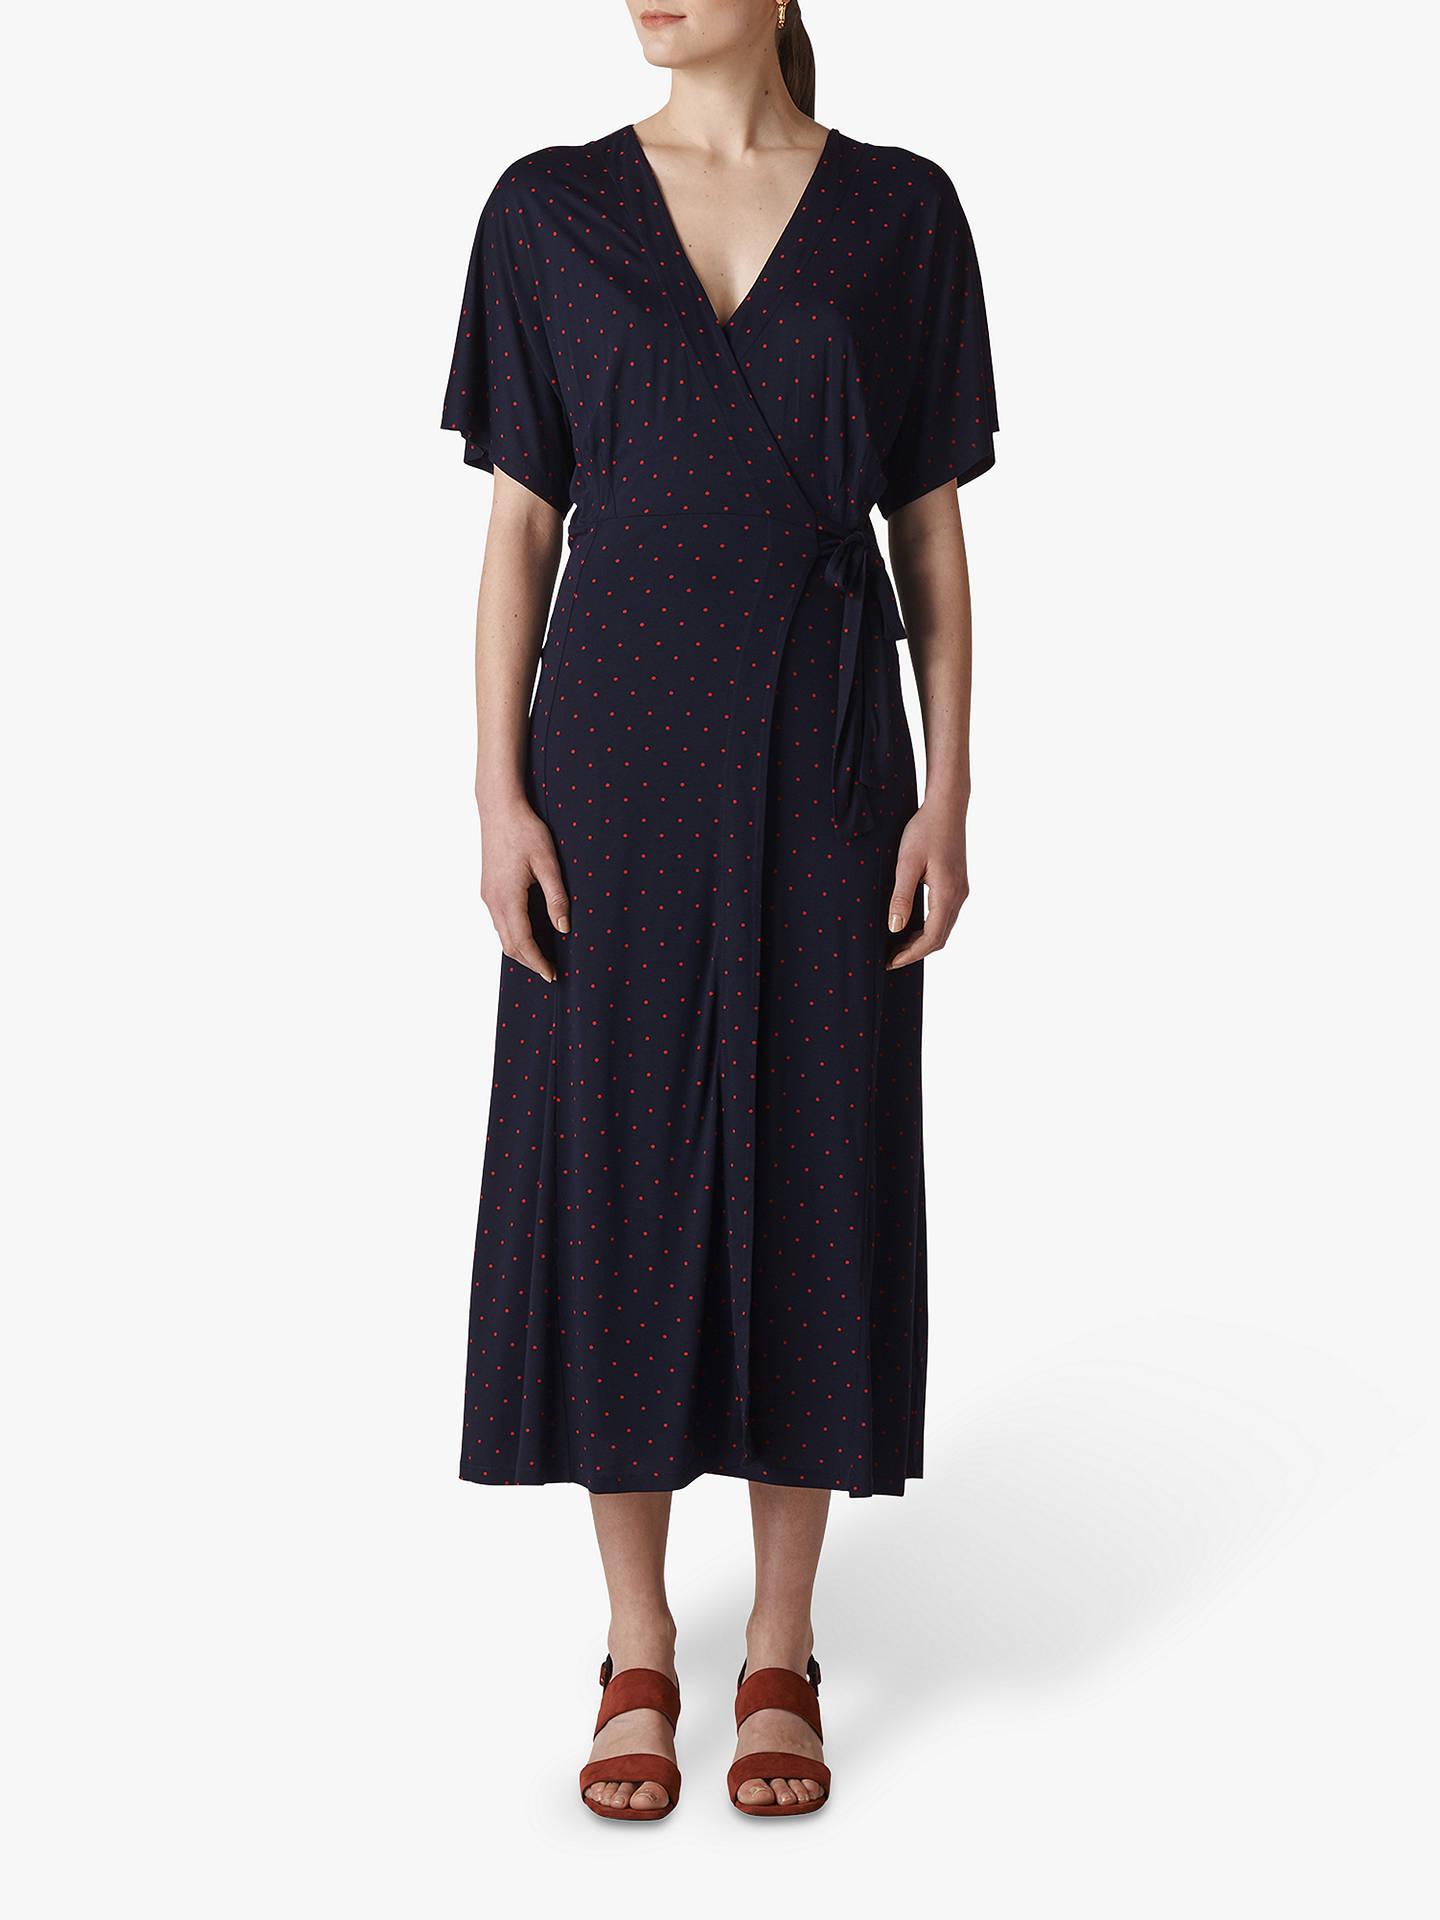 ff24910eebf Buy Whistles Spot Wrap Jersey Dress, Navy/Multi, 6 Online at johnlewis.